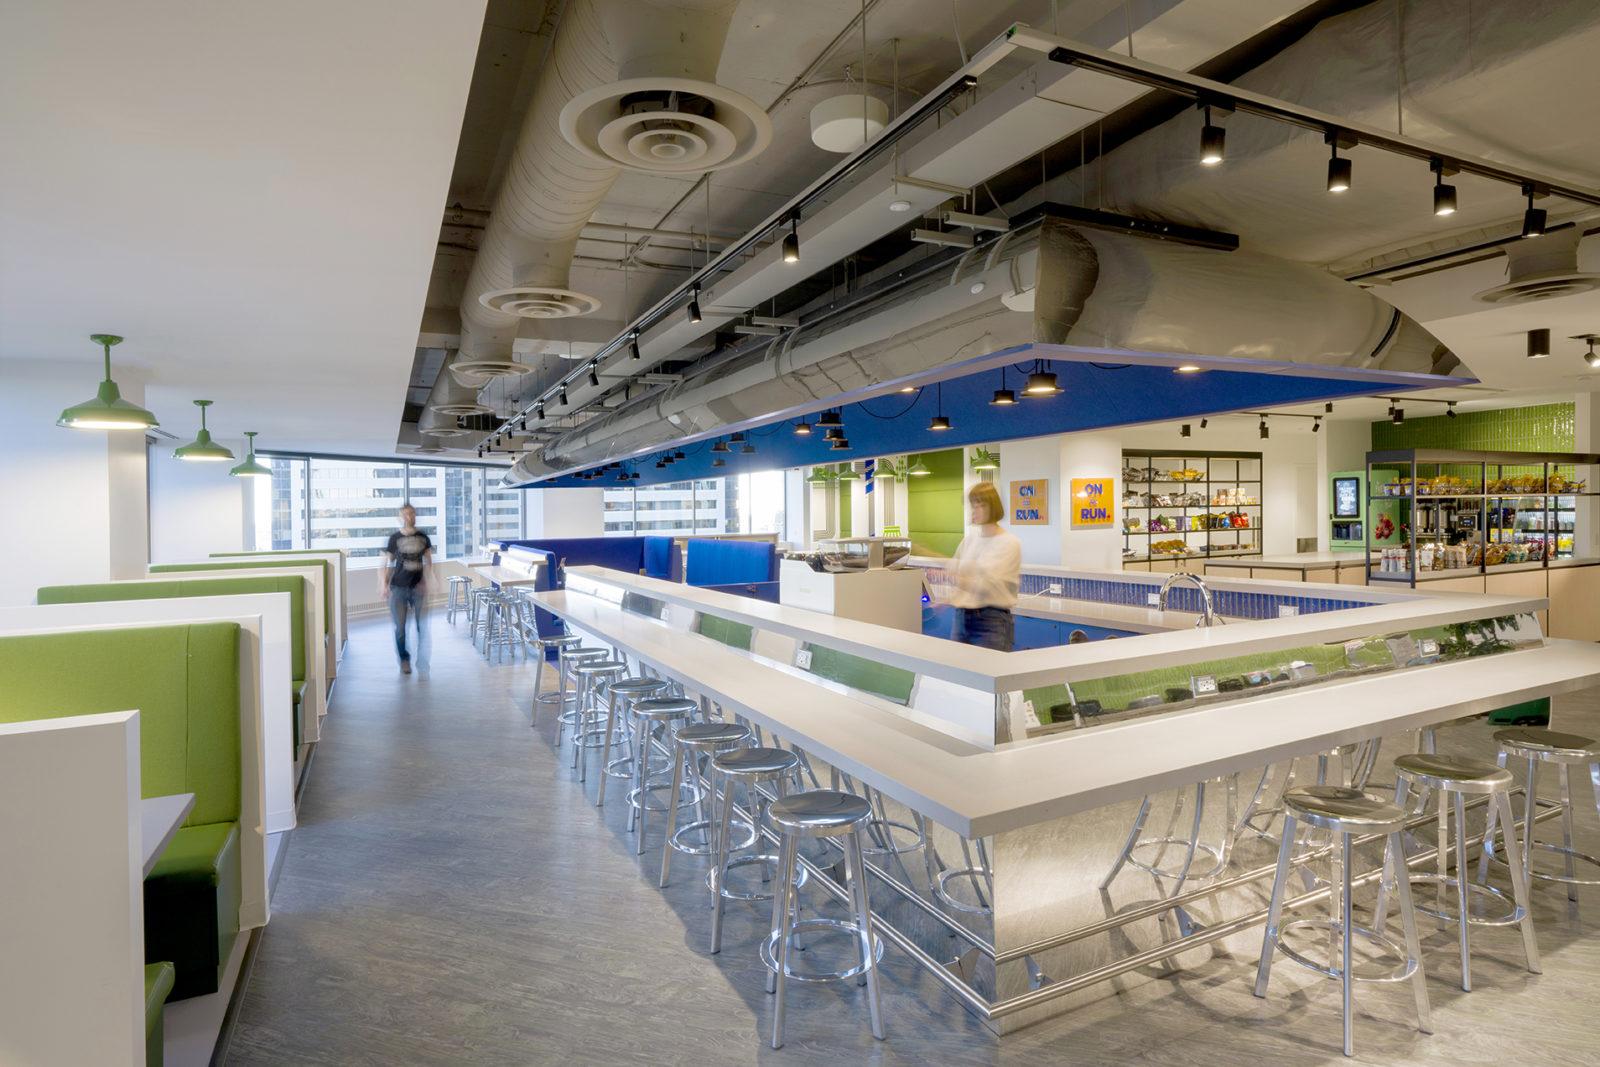 17th Floor Employee Cafe